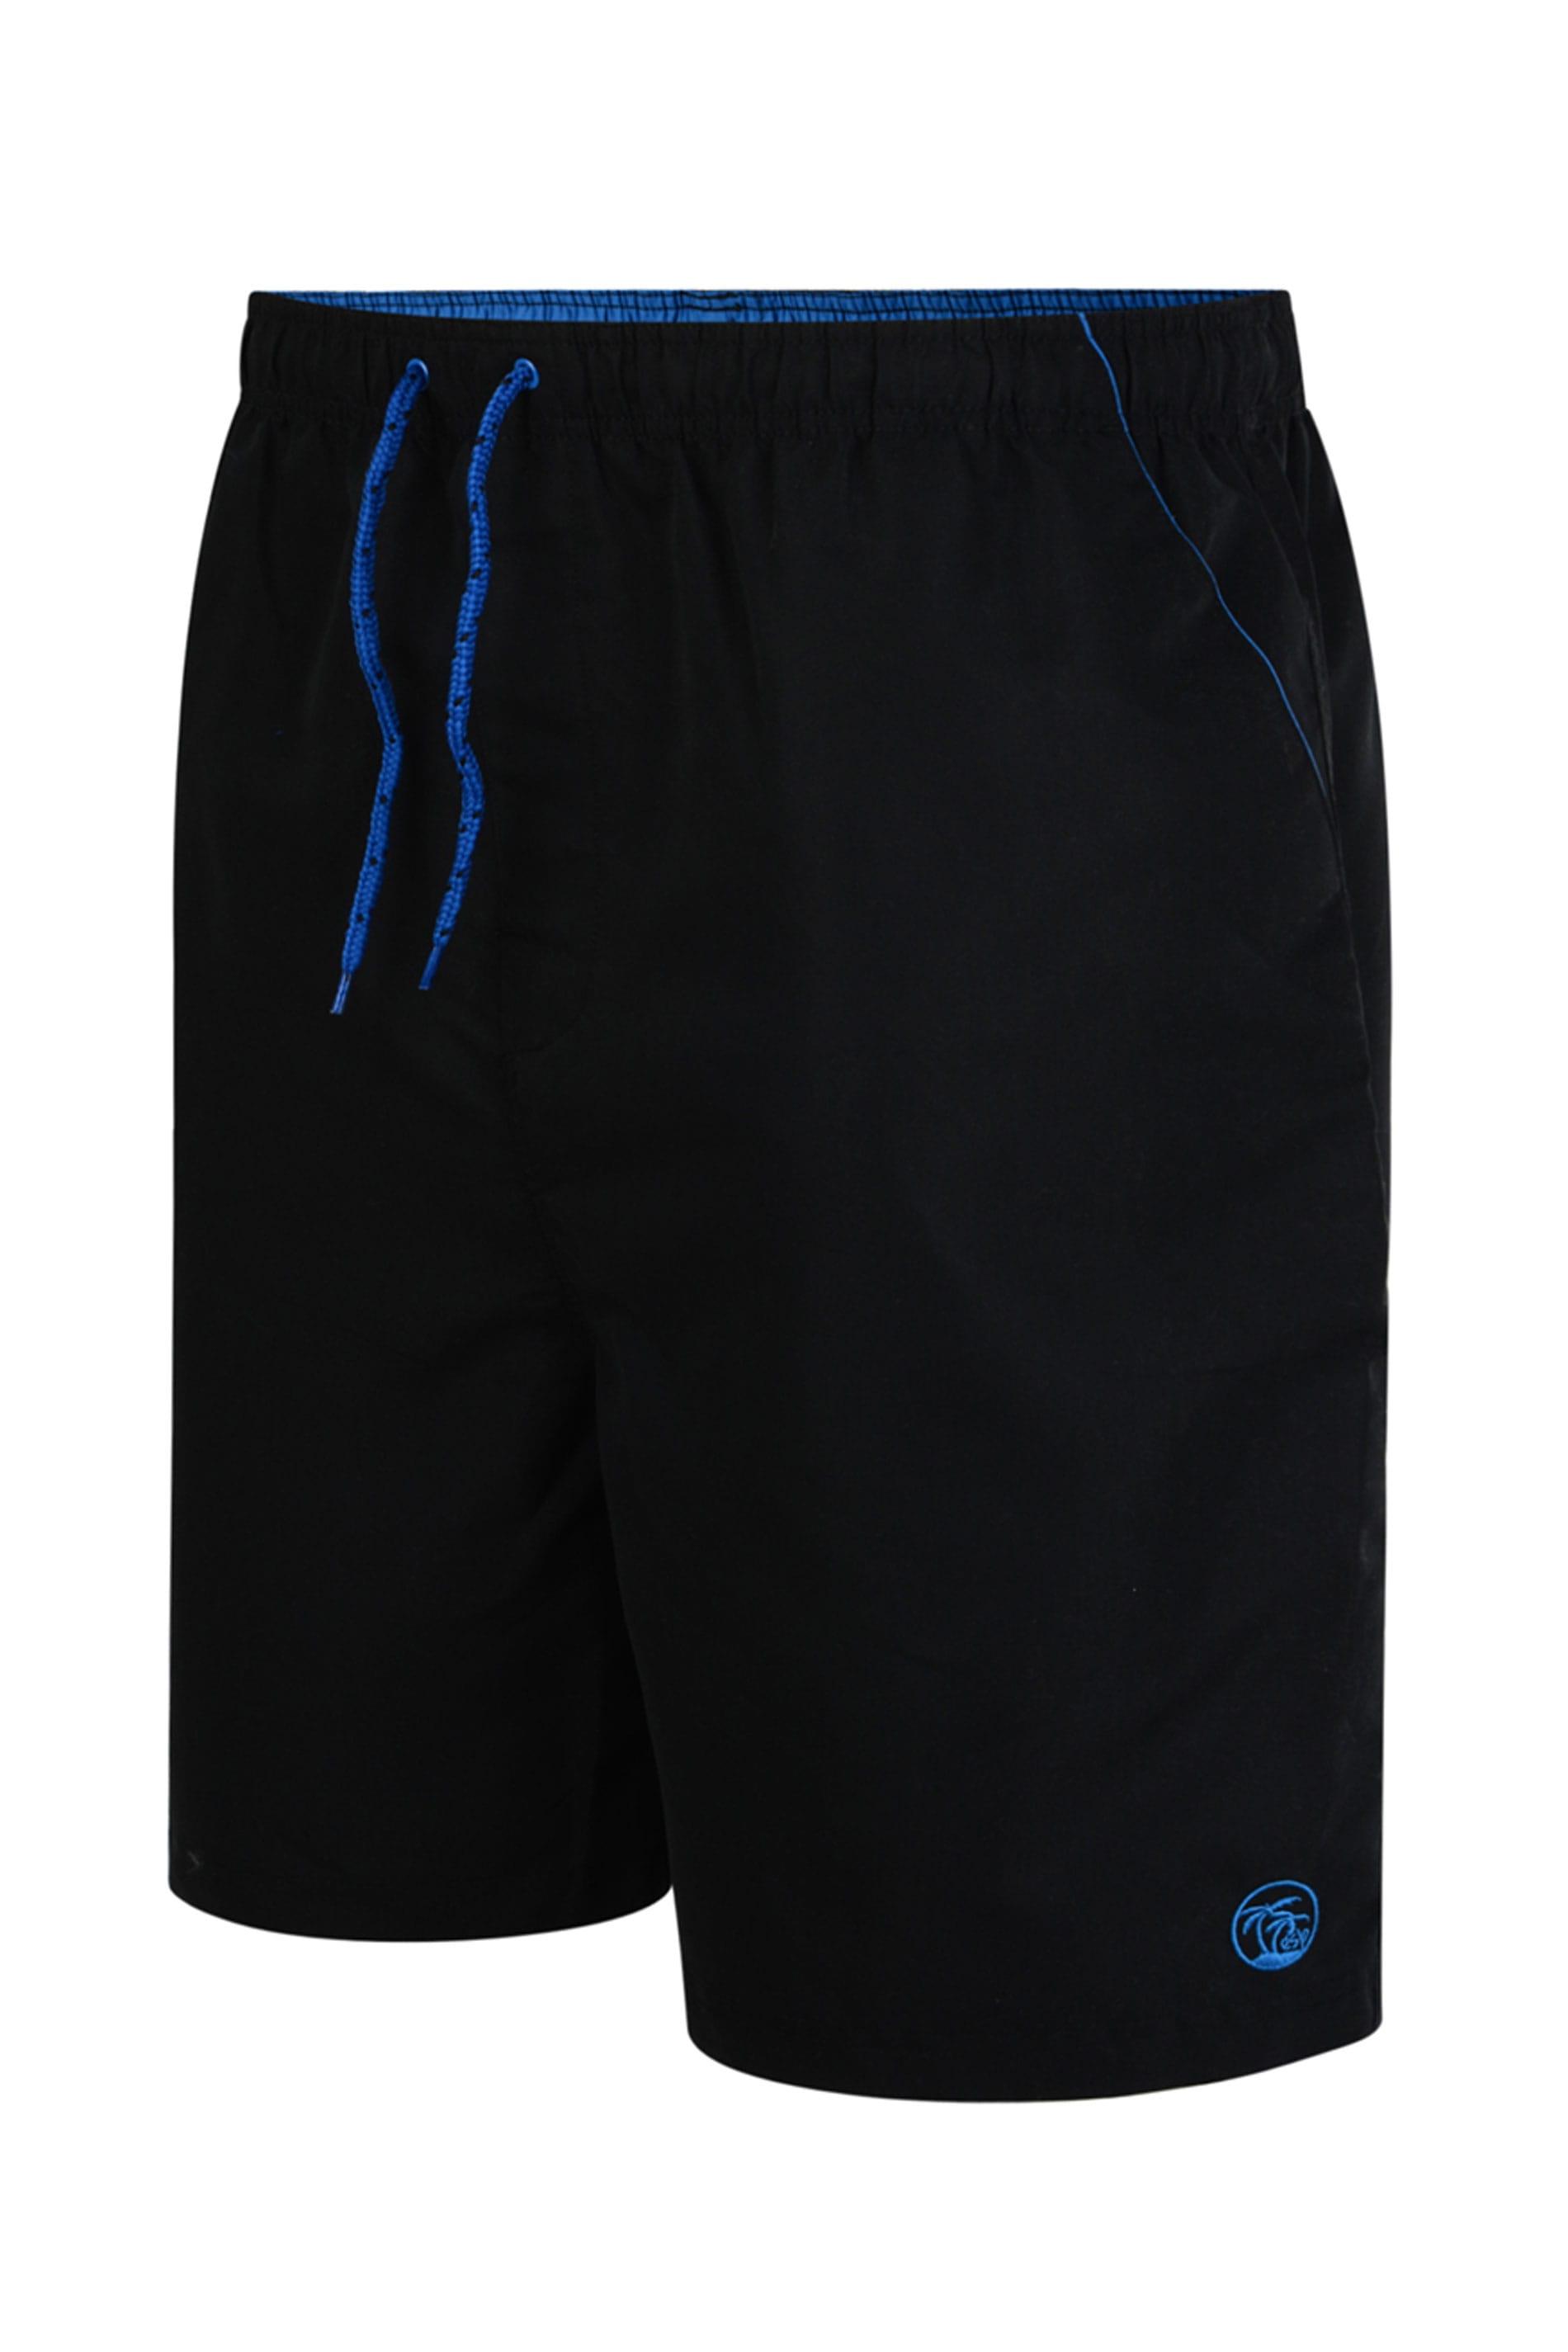 ESPIONAGE Black Swim Shorts